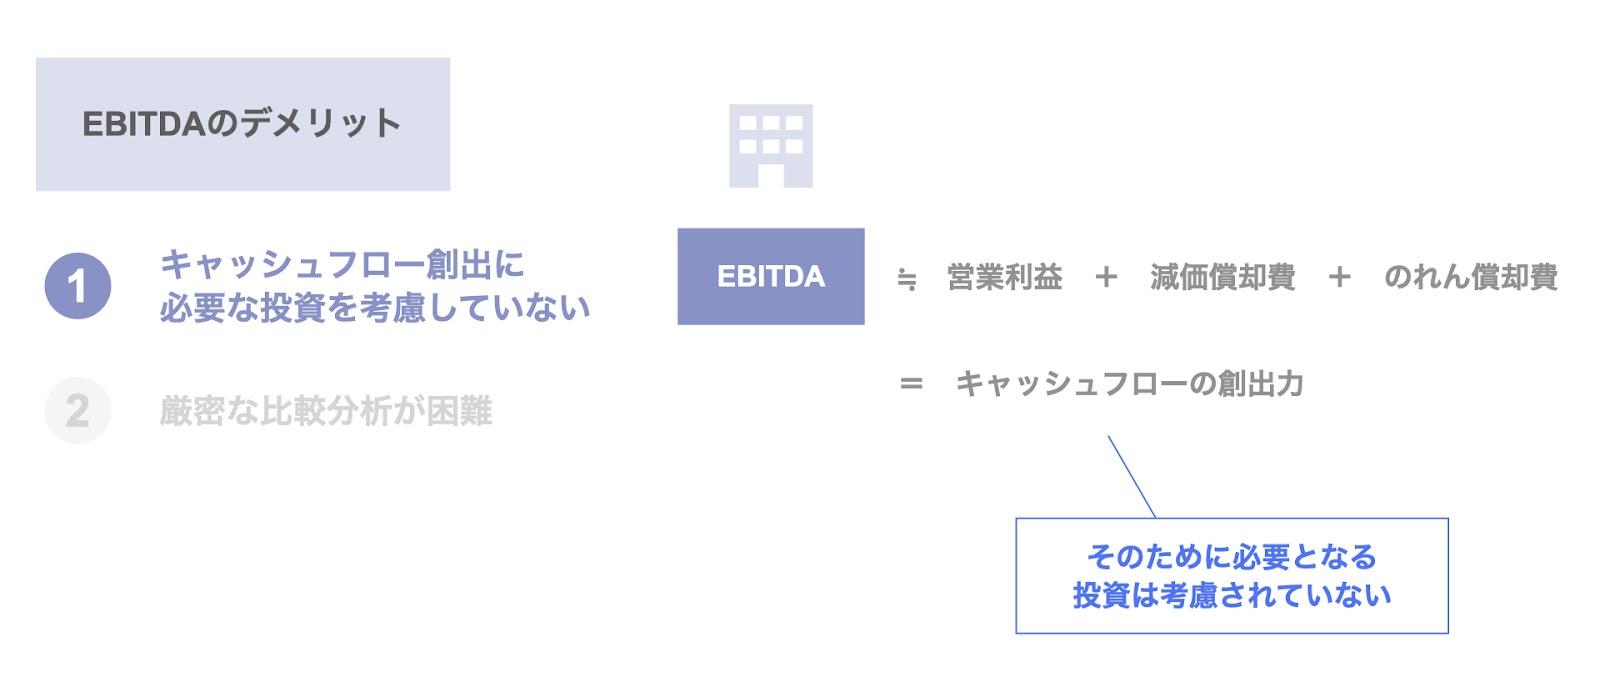 EBITDAのデメリット① キャッシュフロー創出に必要な投資を考慮していない